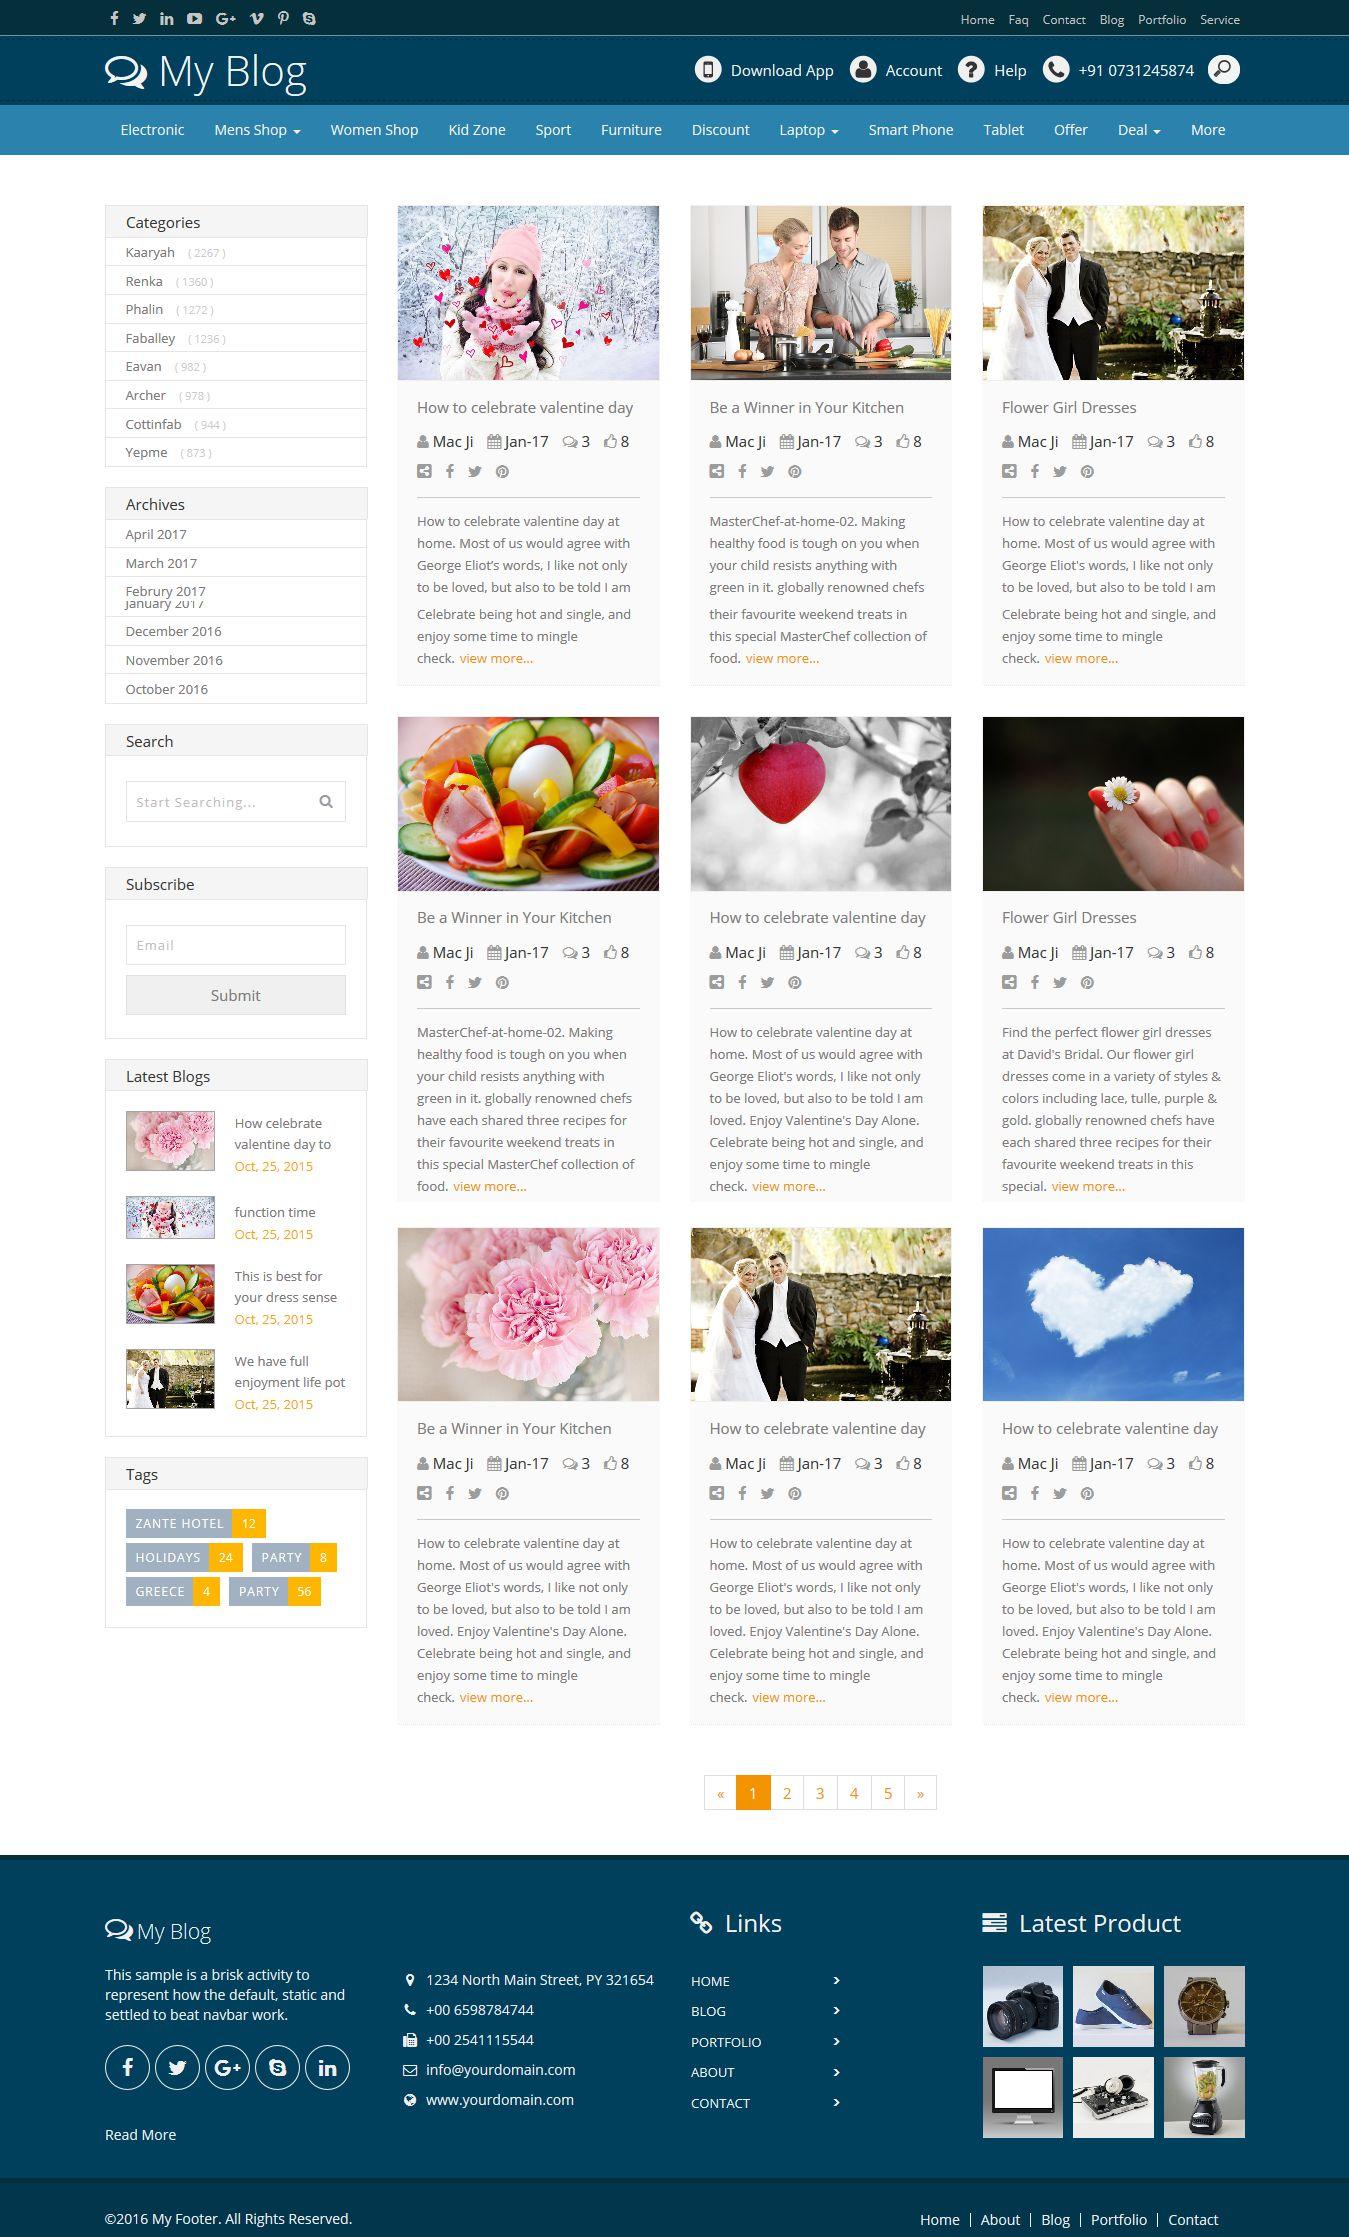 Bootstrap Blog Layout Design